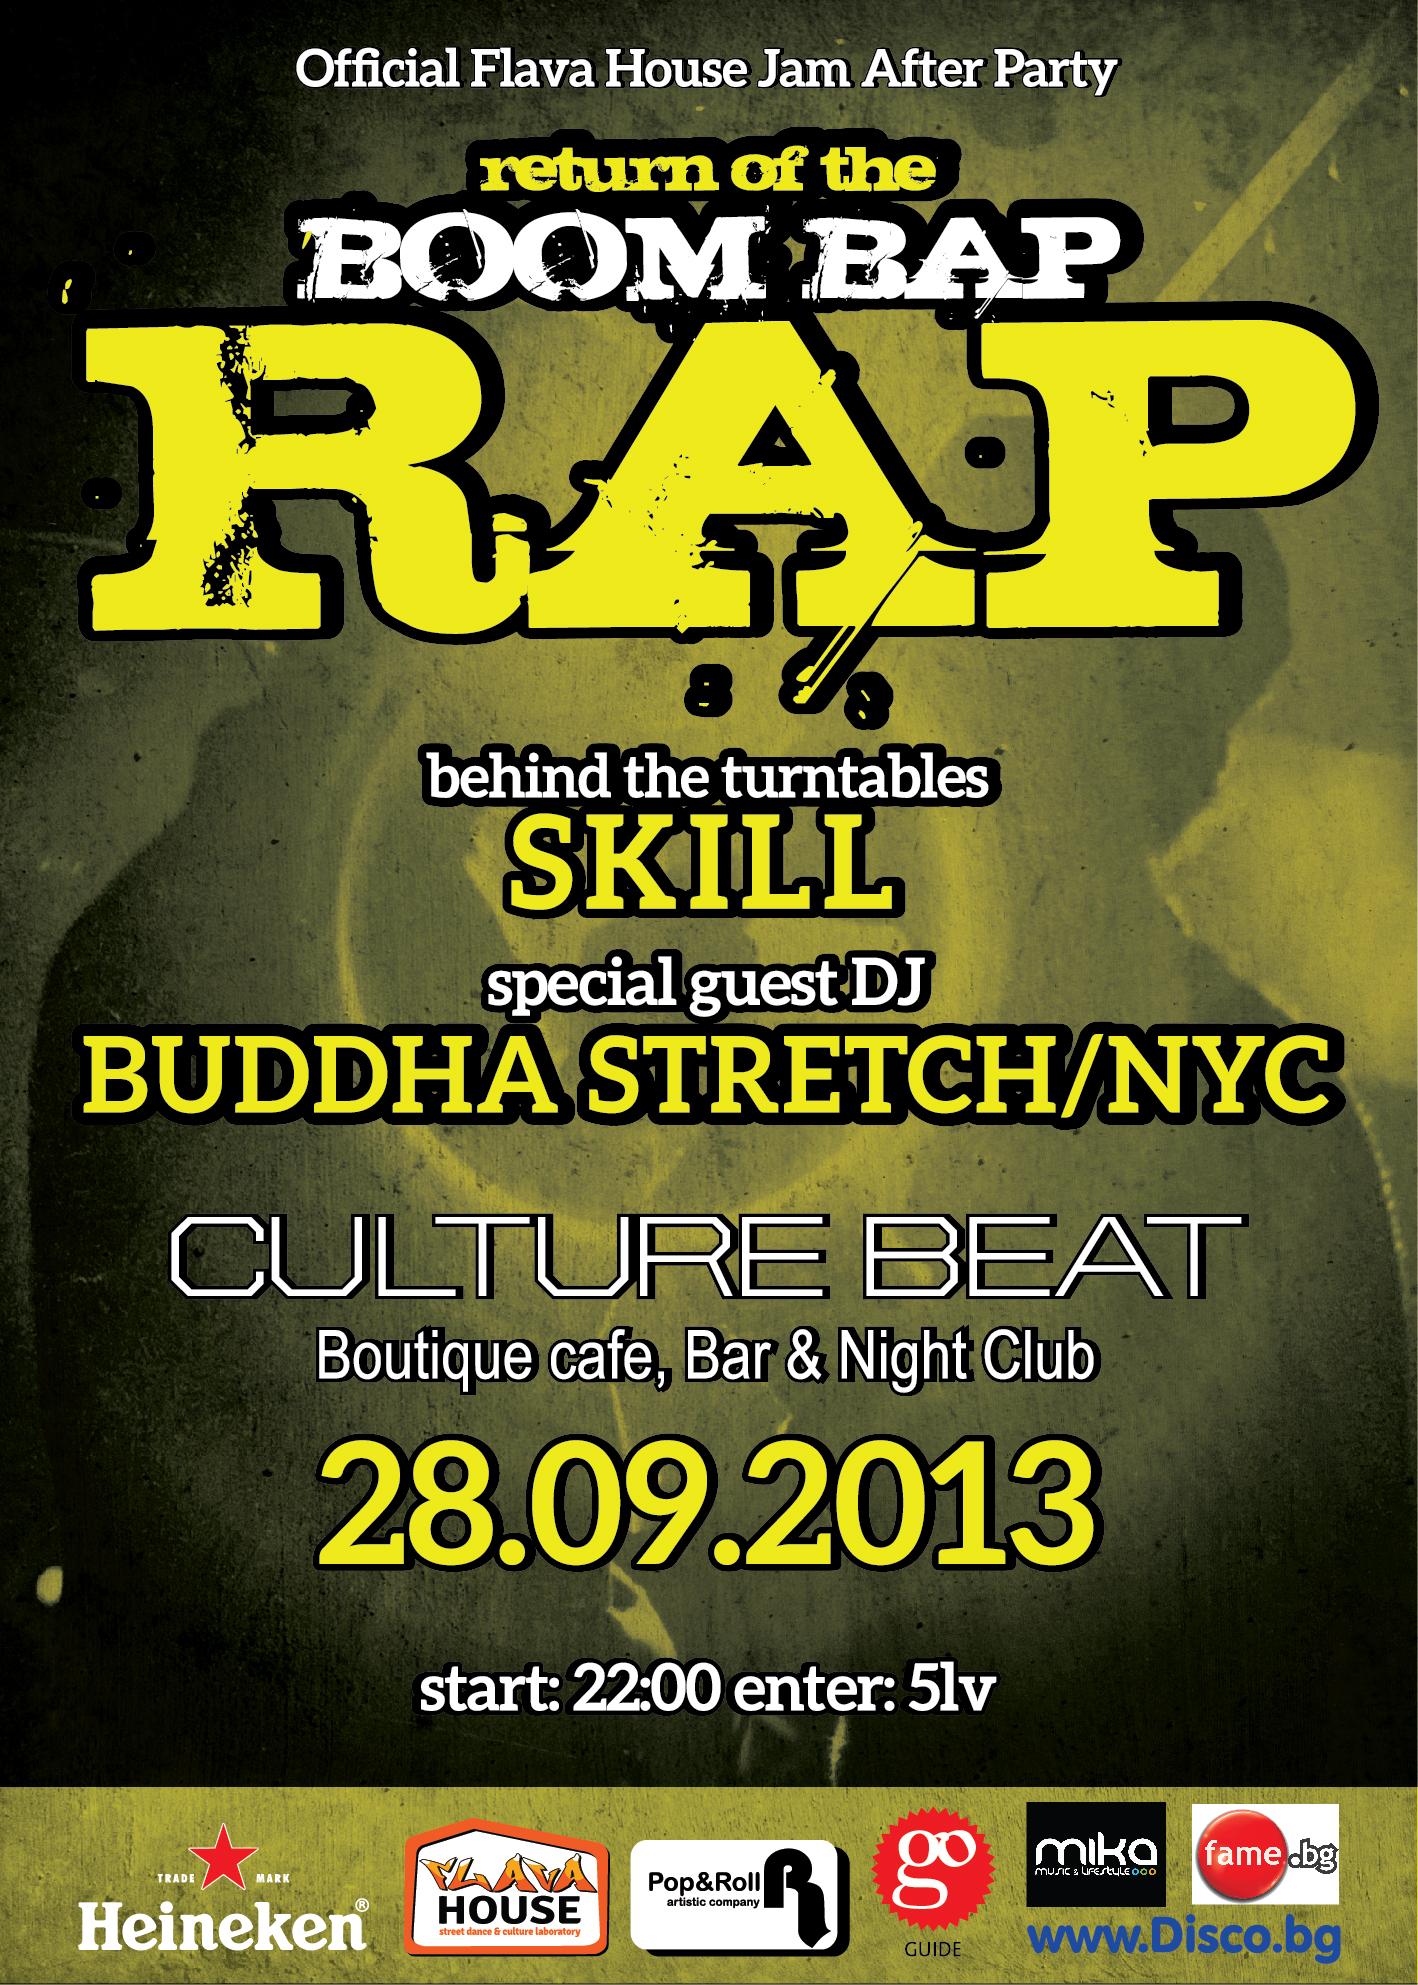 Return of the boom bap rap facebook flyer.jpg